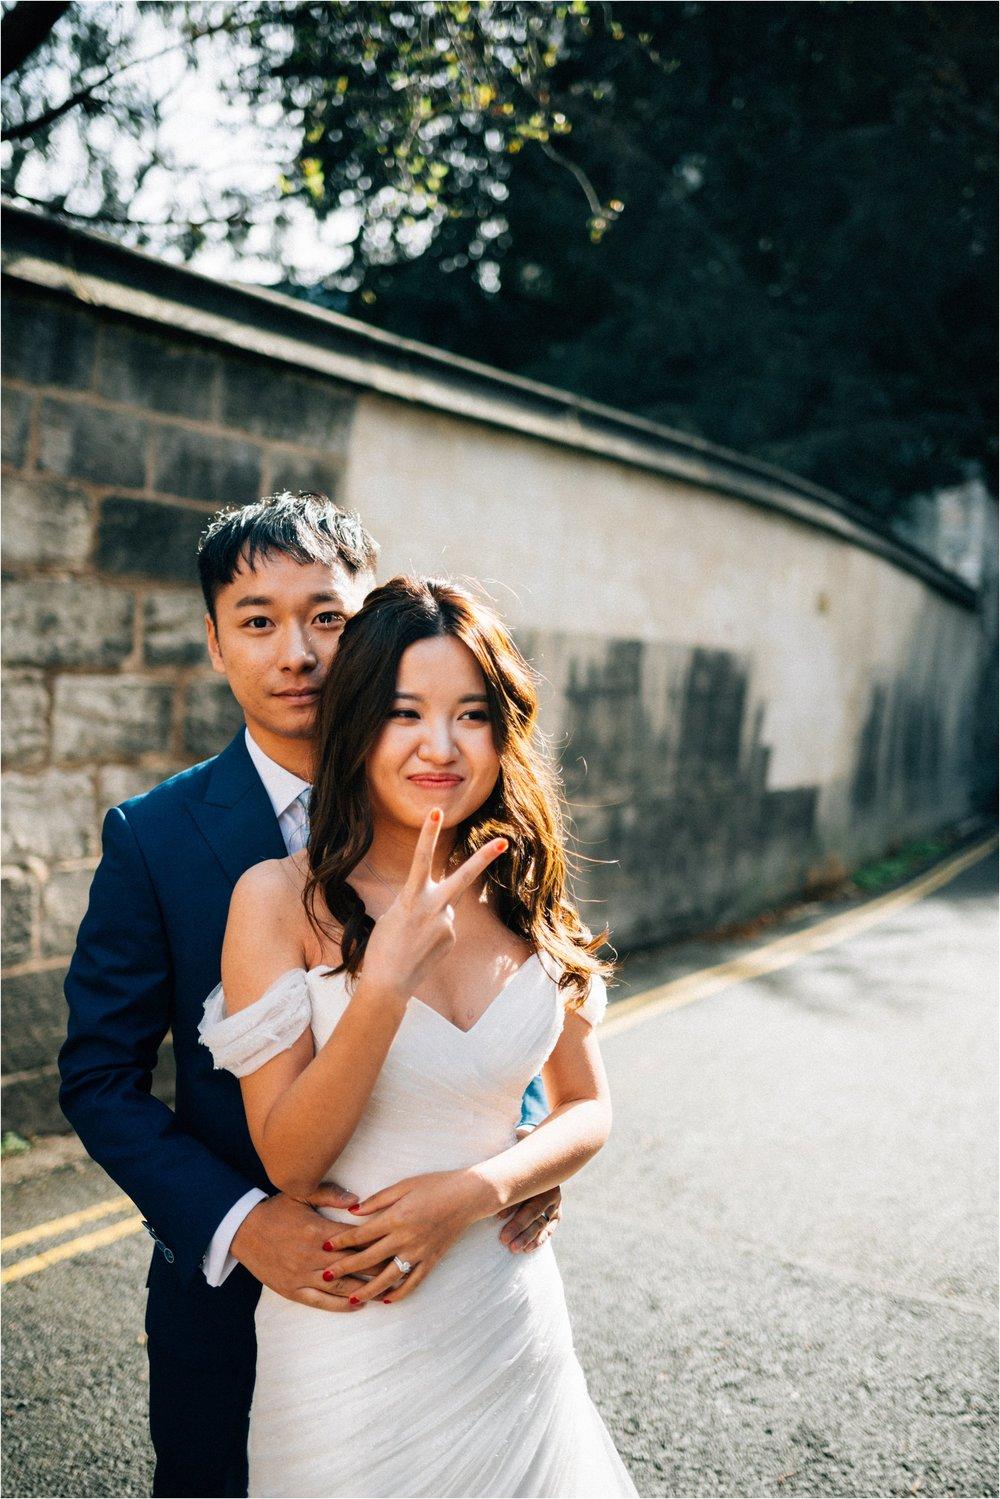 York city elopement wedding photographer_0079.jpg